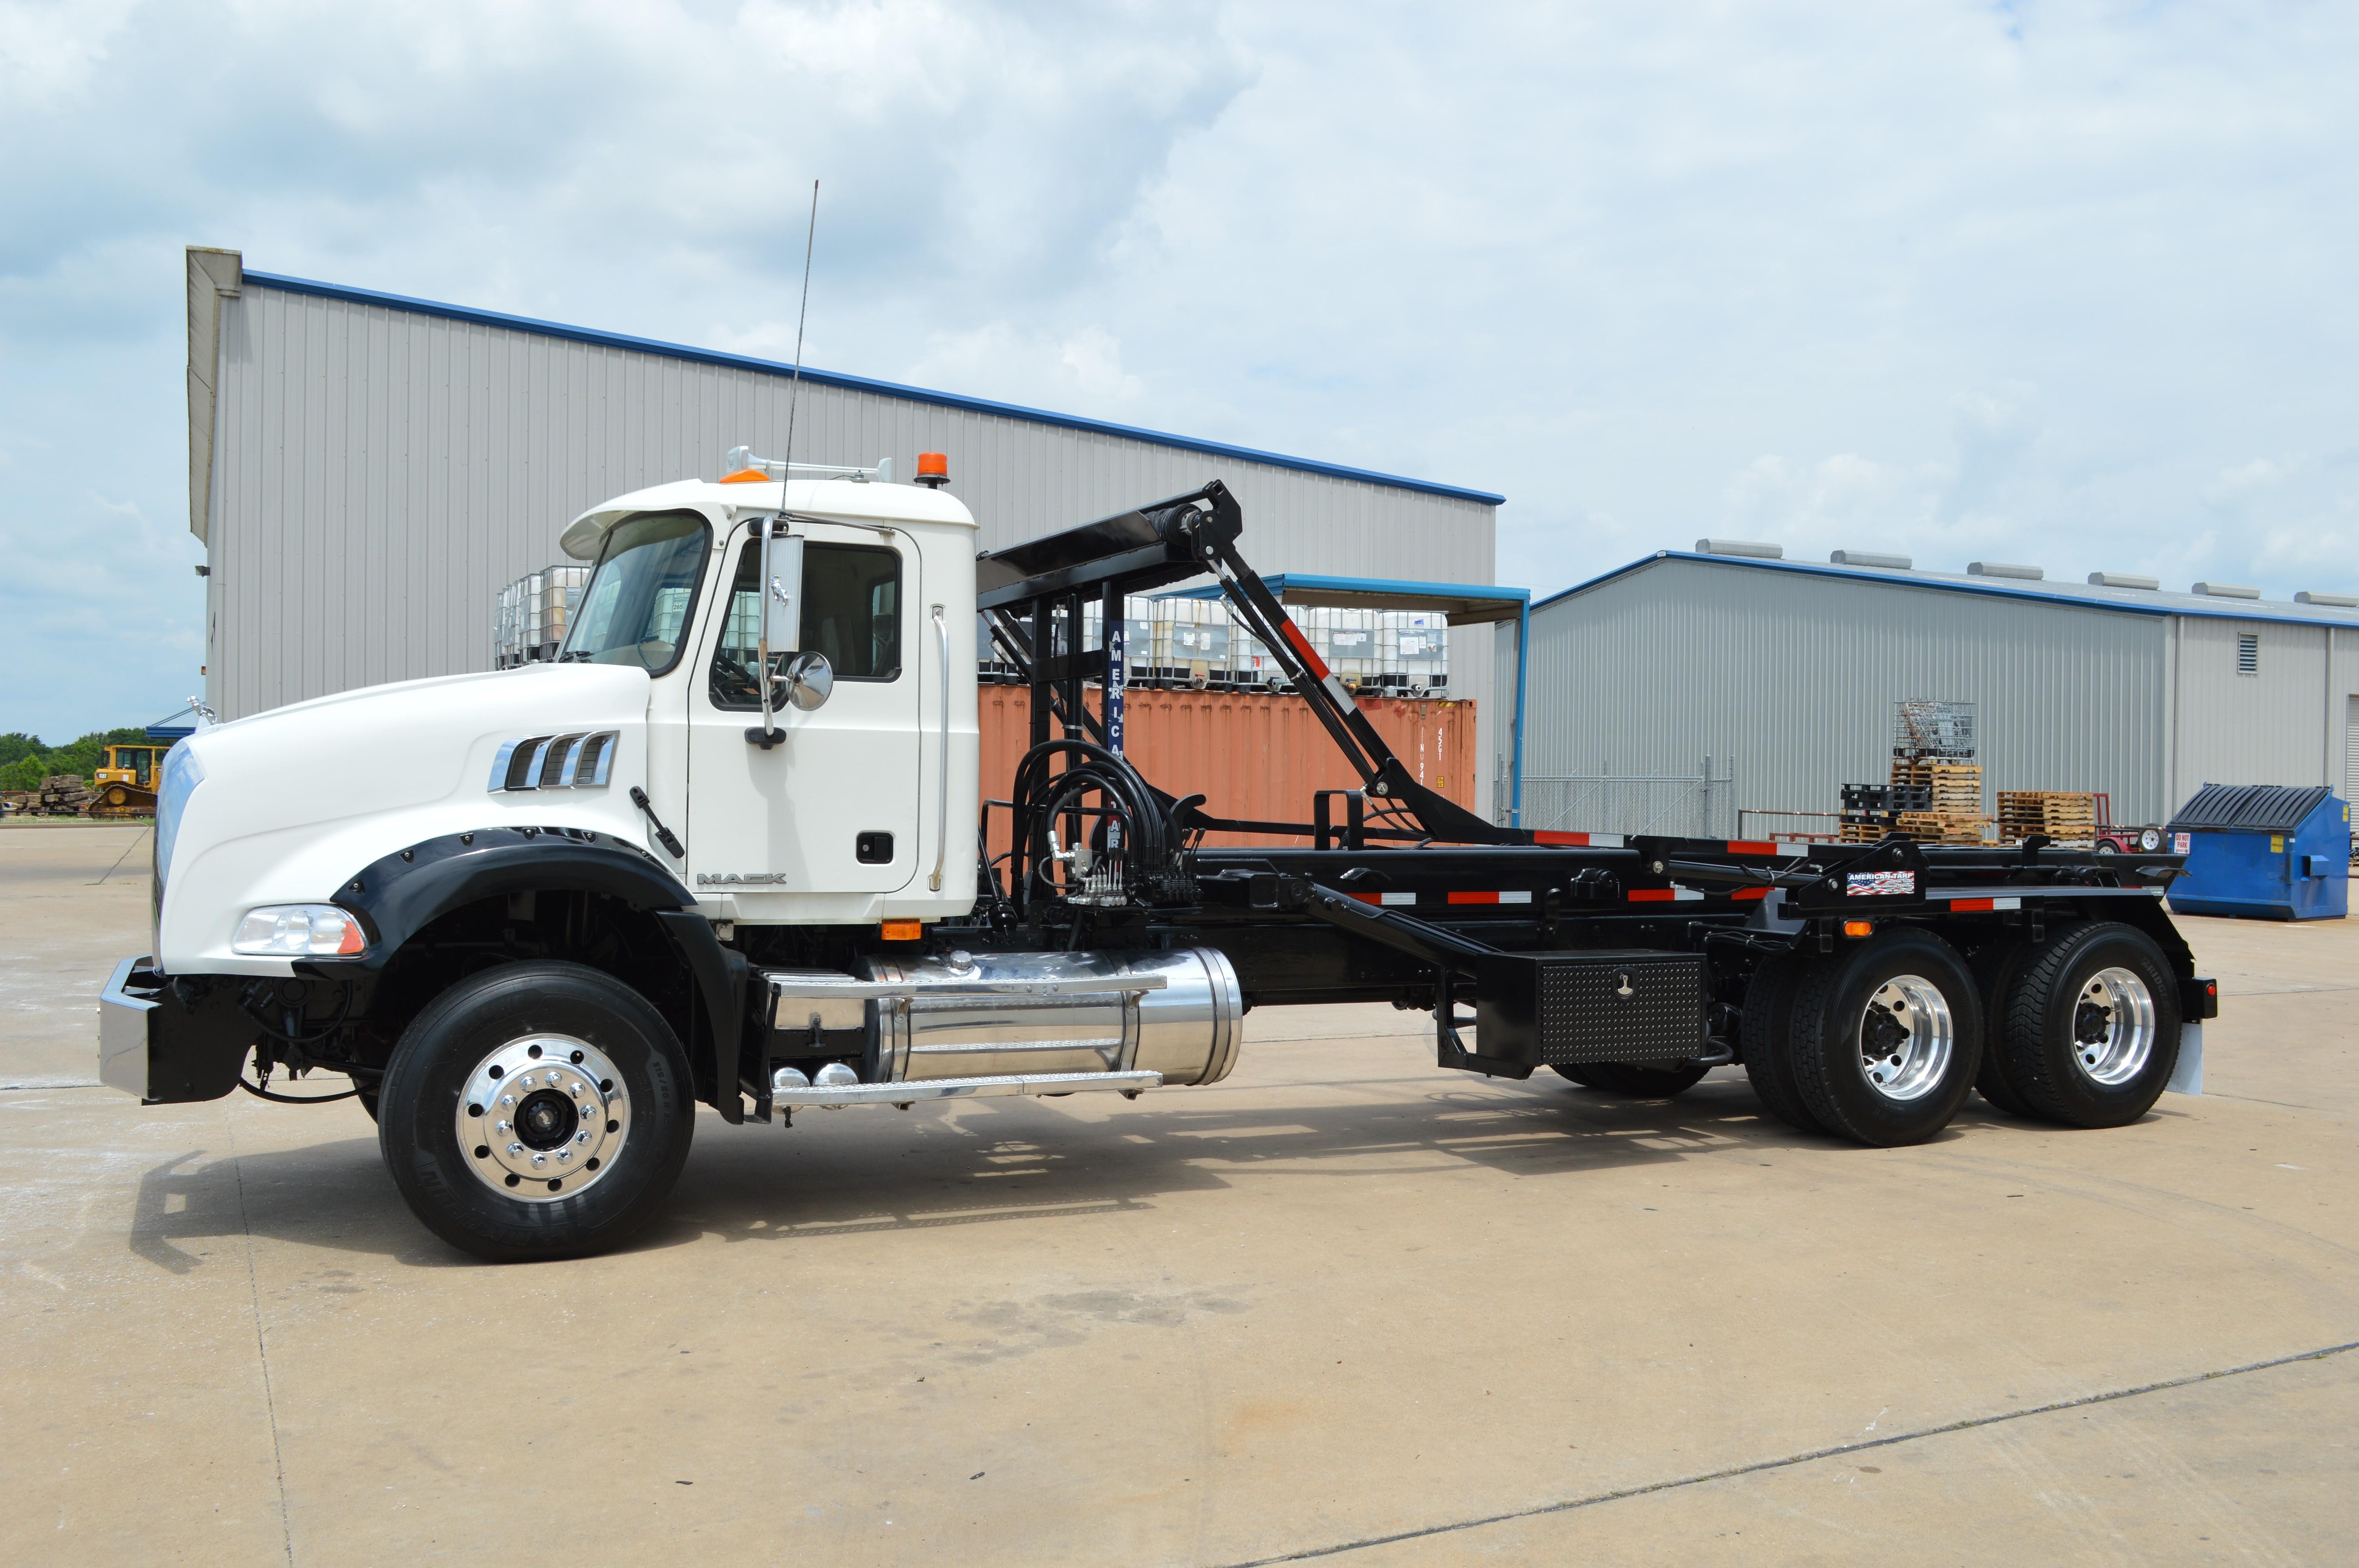 Used, 2010, Mack, GU813 Roll Off Truck, Transfer Trucks